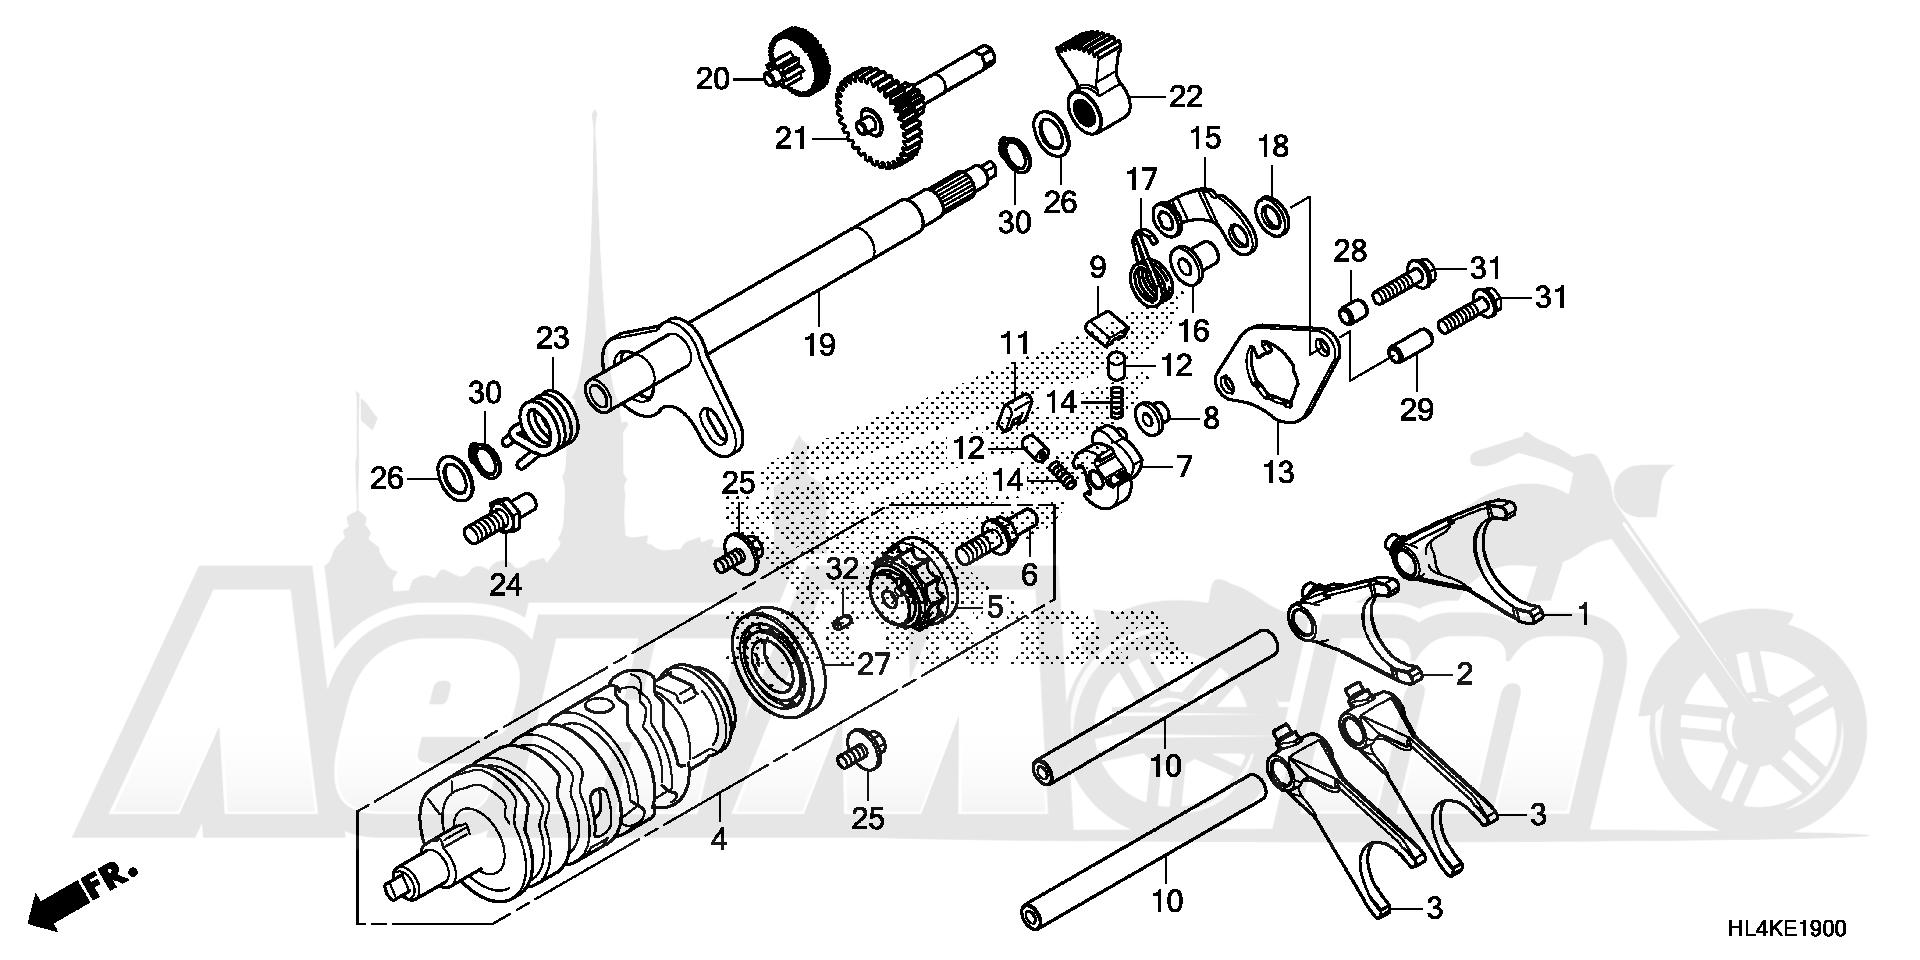 Запчасти для Квадроцикла Honda 2019 SXS1000M3P Раздел: GEARSHIFT FORK | переключение передач вилка